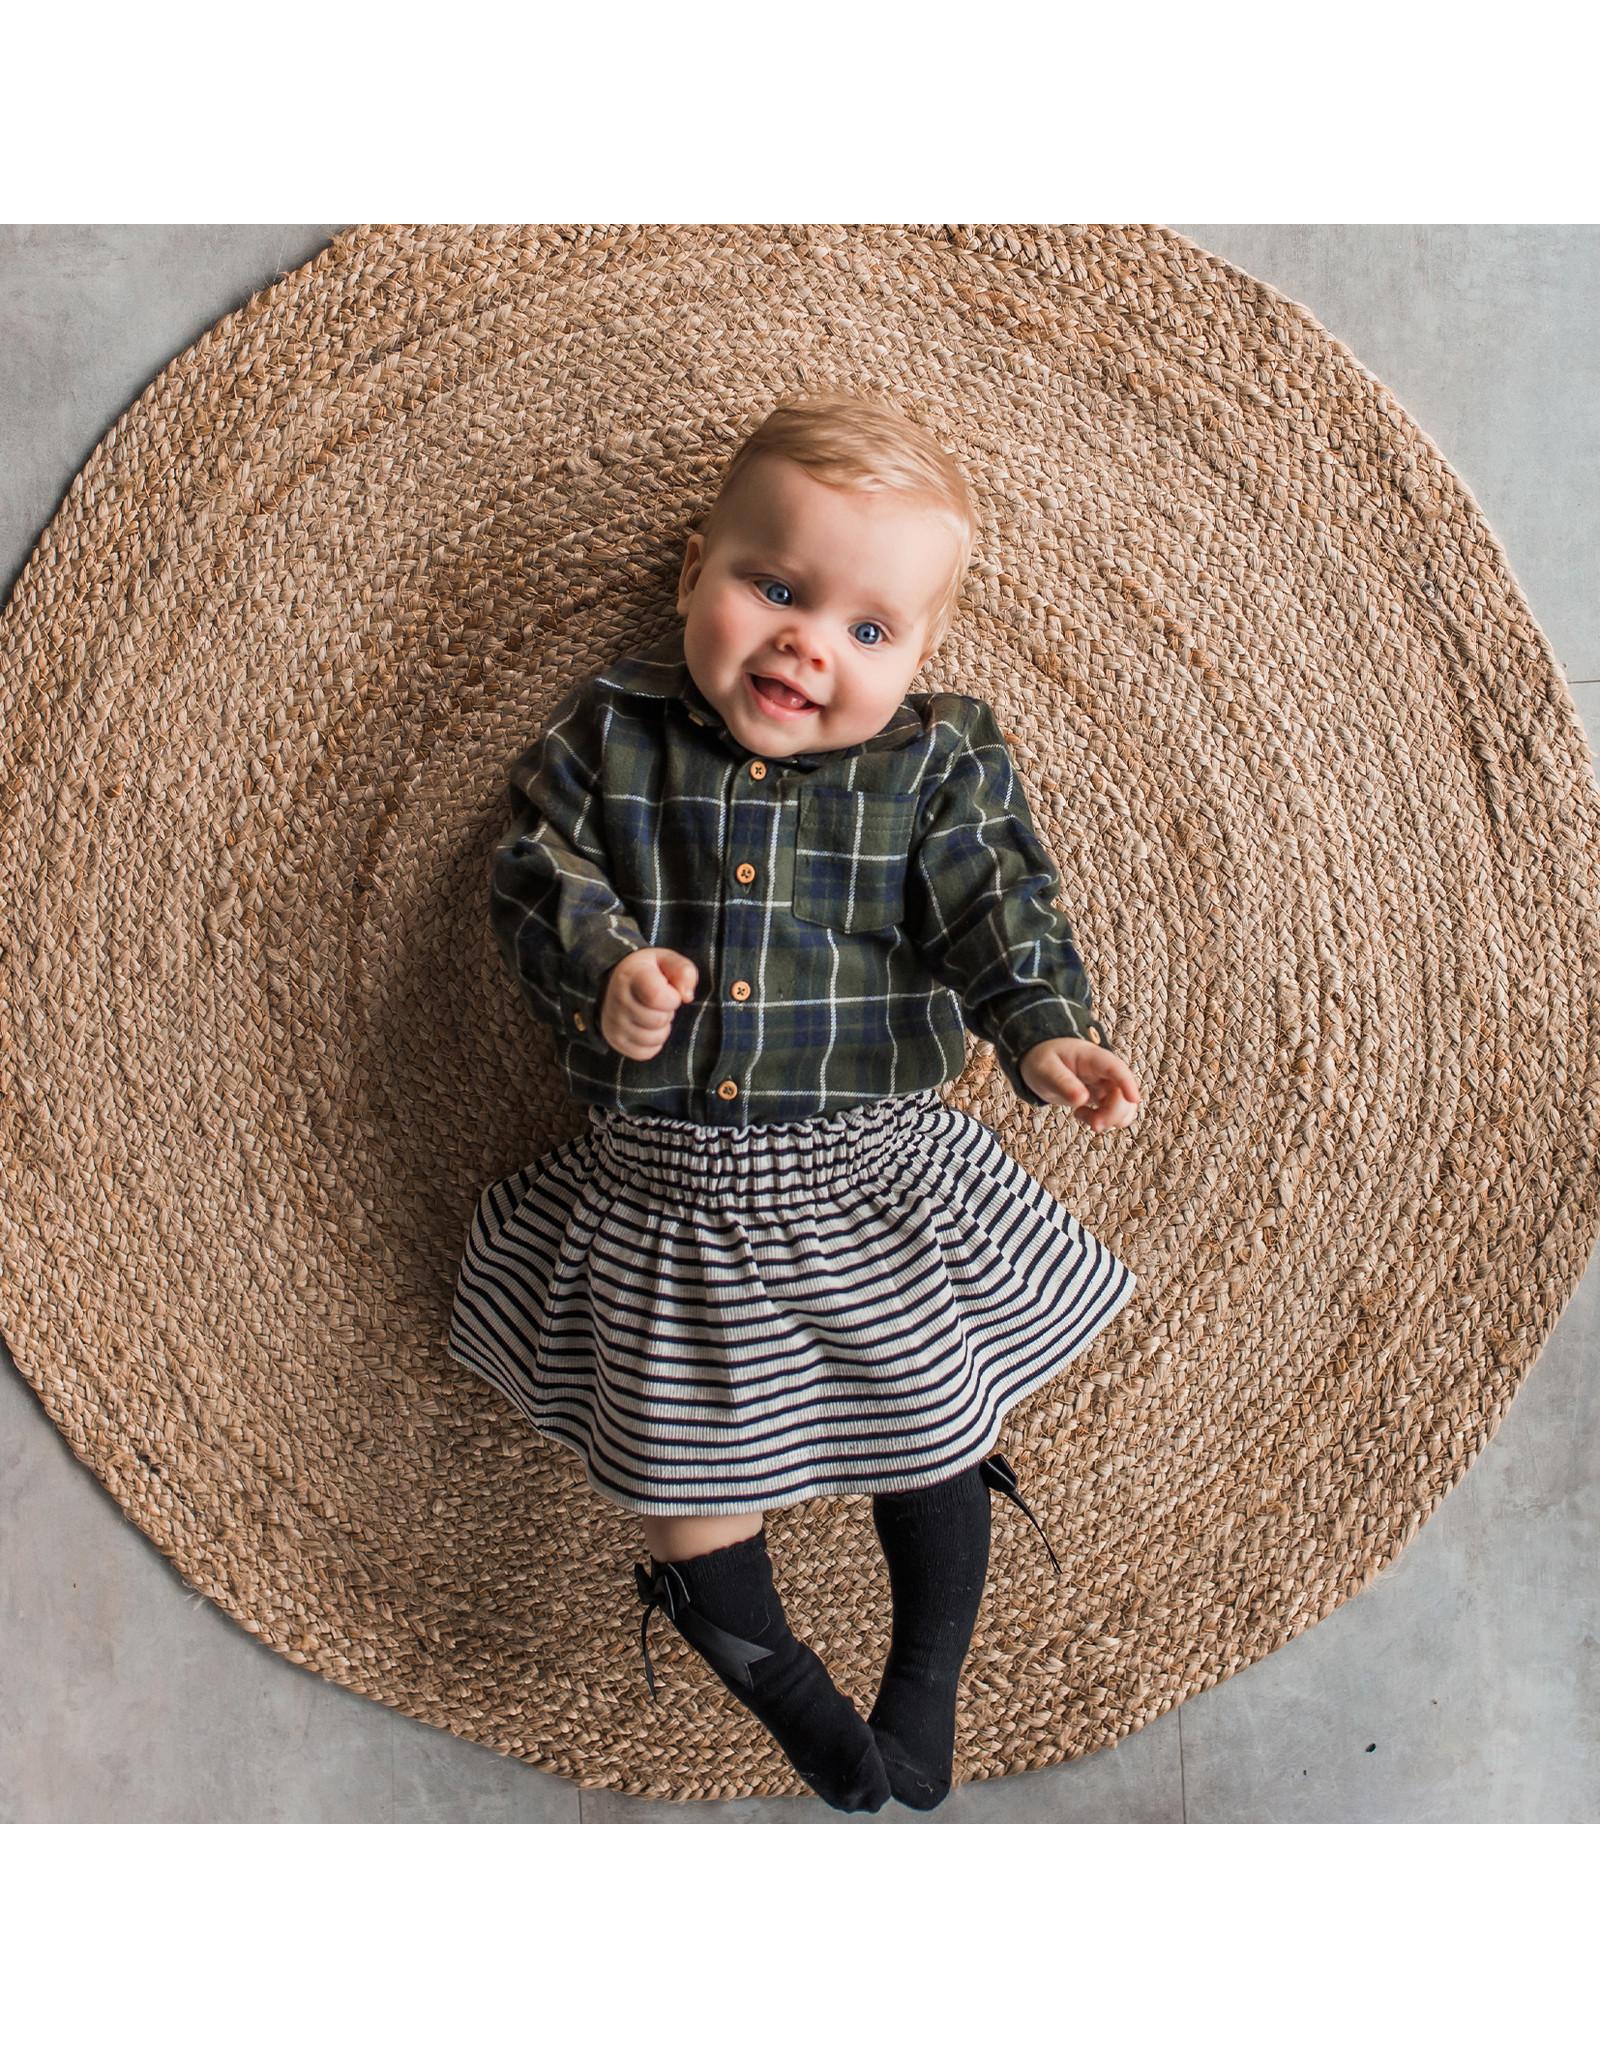 Your Wishes YW   Beige - Stripes   Skirt   Chalk